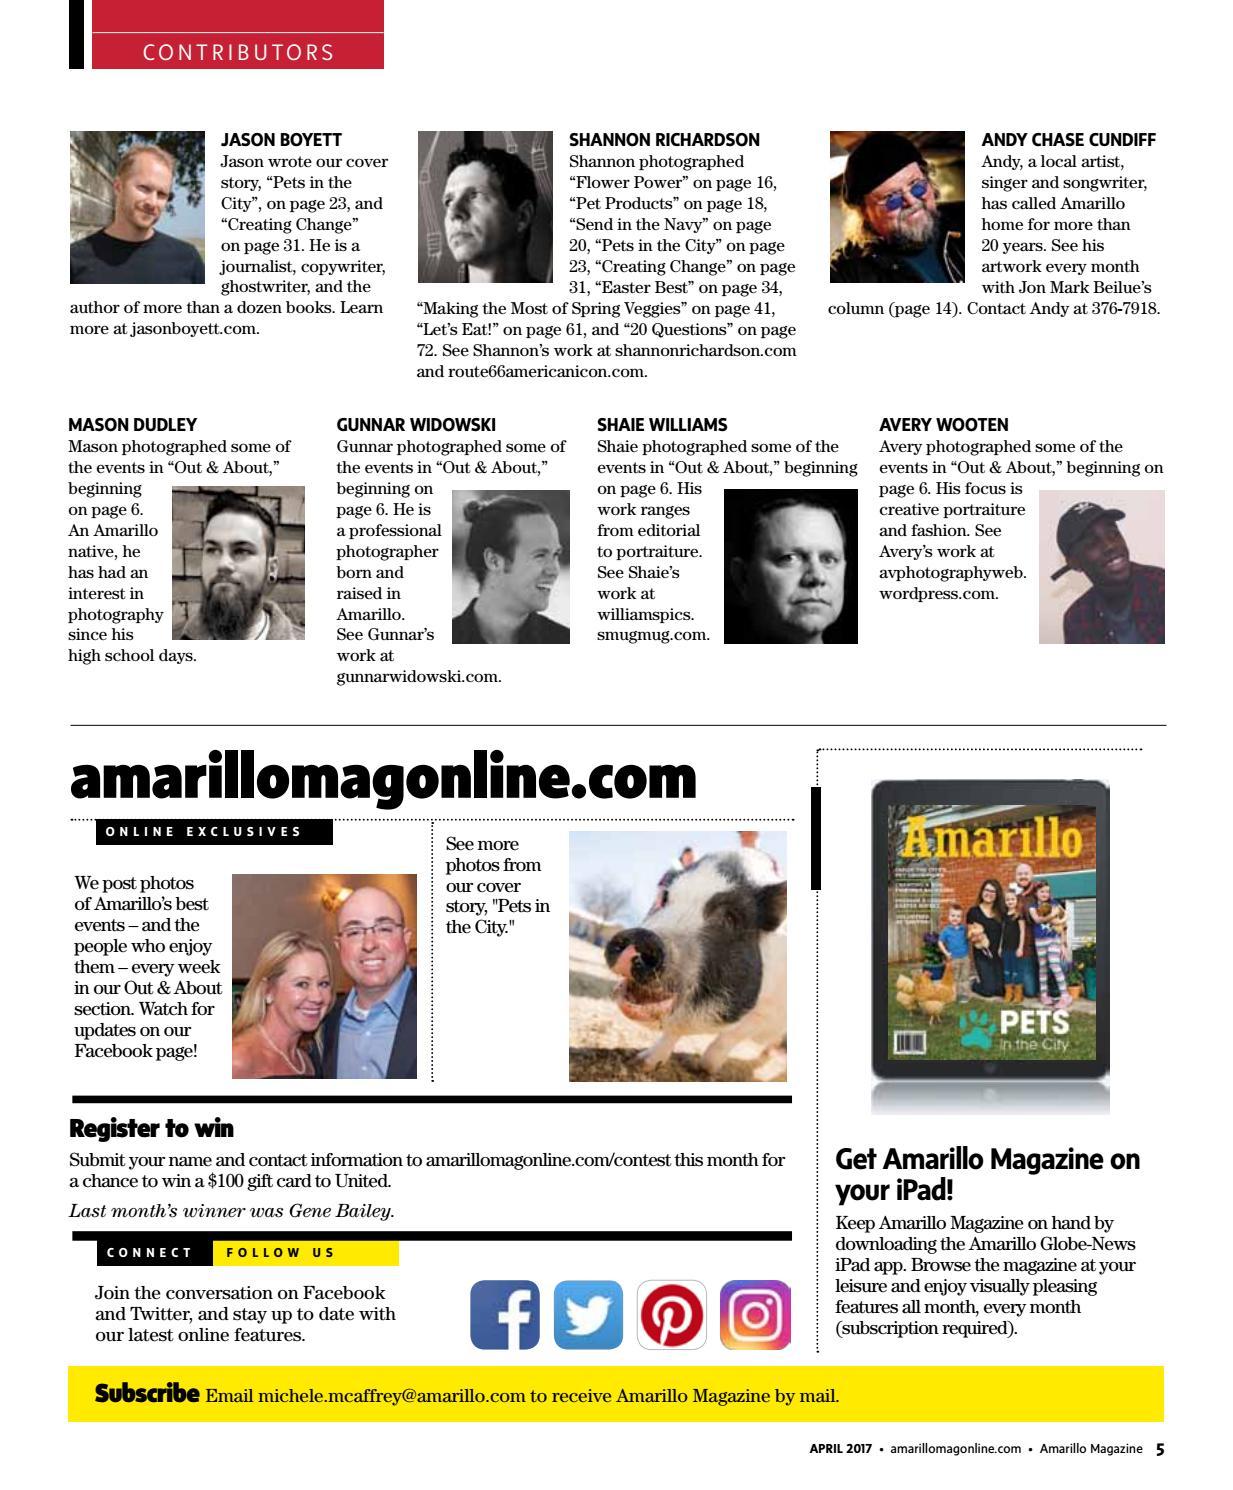 amarillo online magazine